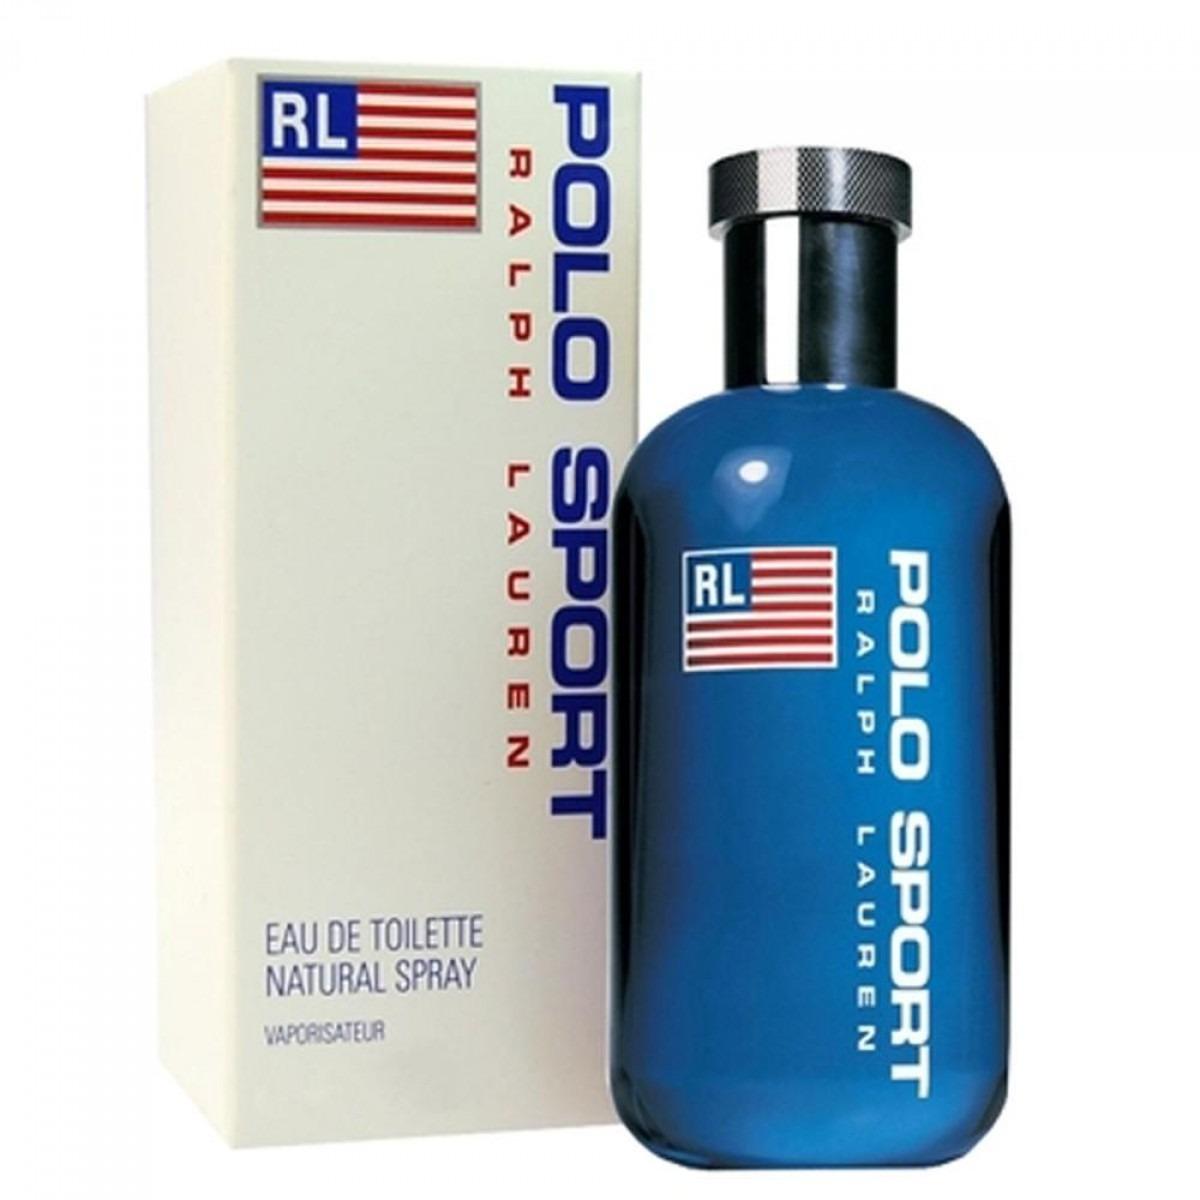 5428aaf23cae2 perfume polo sport 125ml polo ralph louren original toilette. Carregando  zoom.